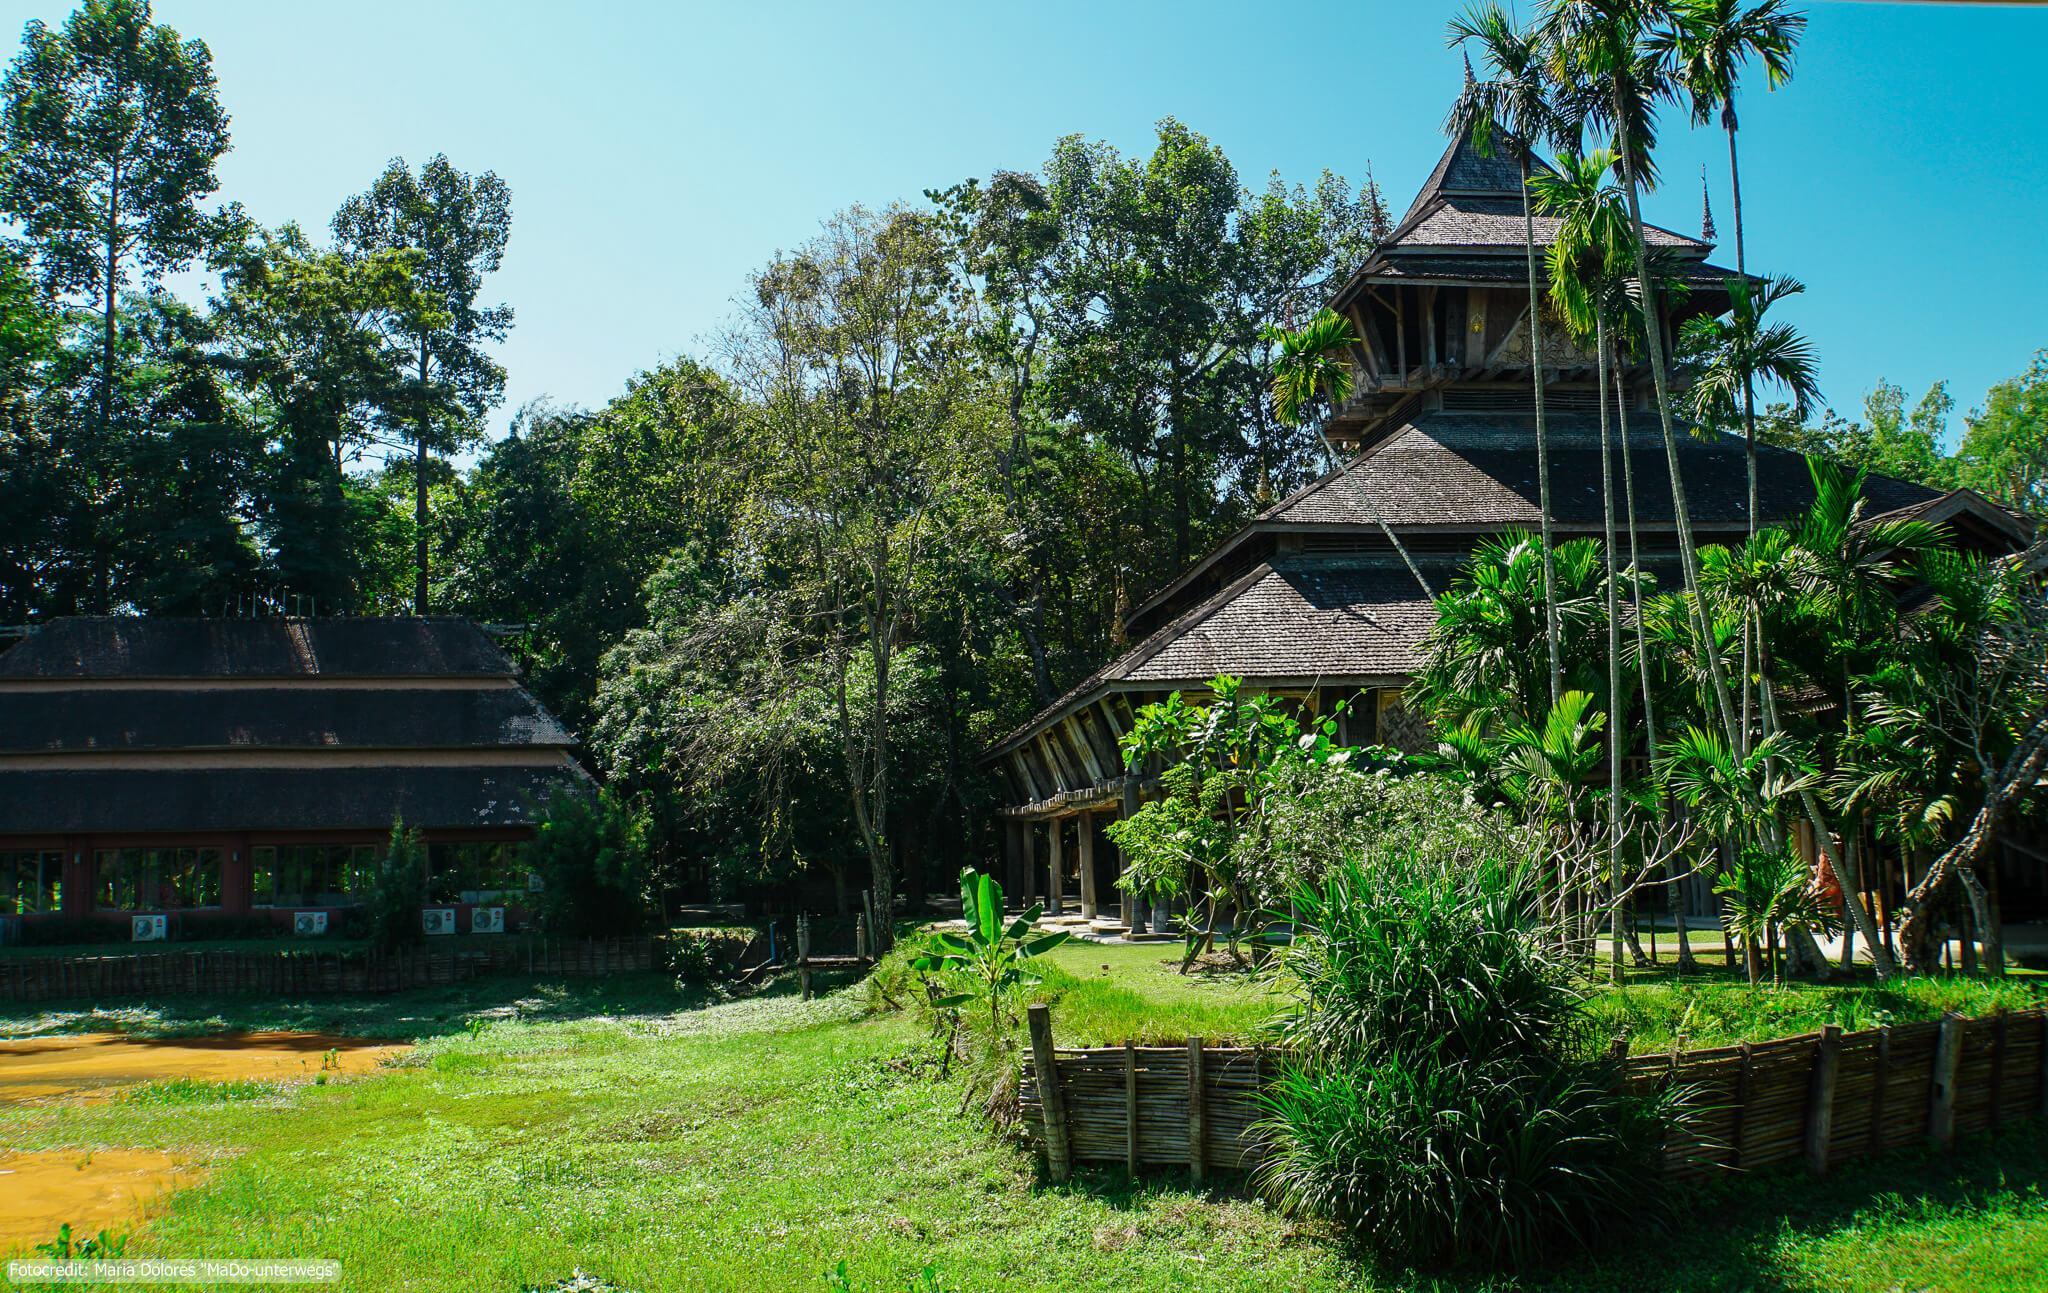 Mae Fah Luang Art & Culture Park in Chiang Rai (Reisetagebuch «Thailand als Alleinreisende ohne Roller entdecken»)